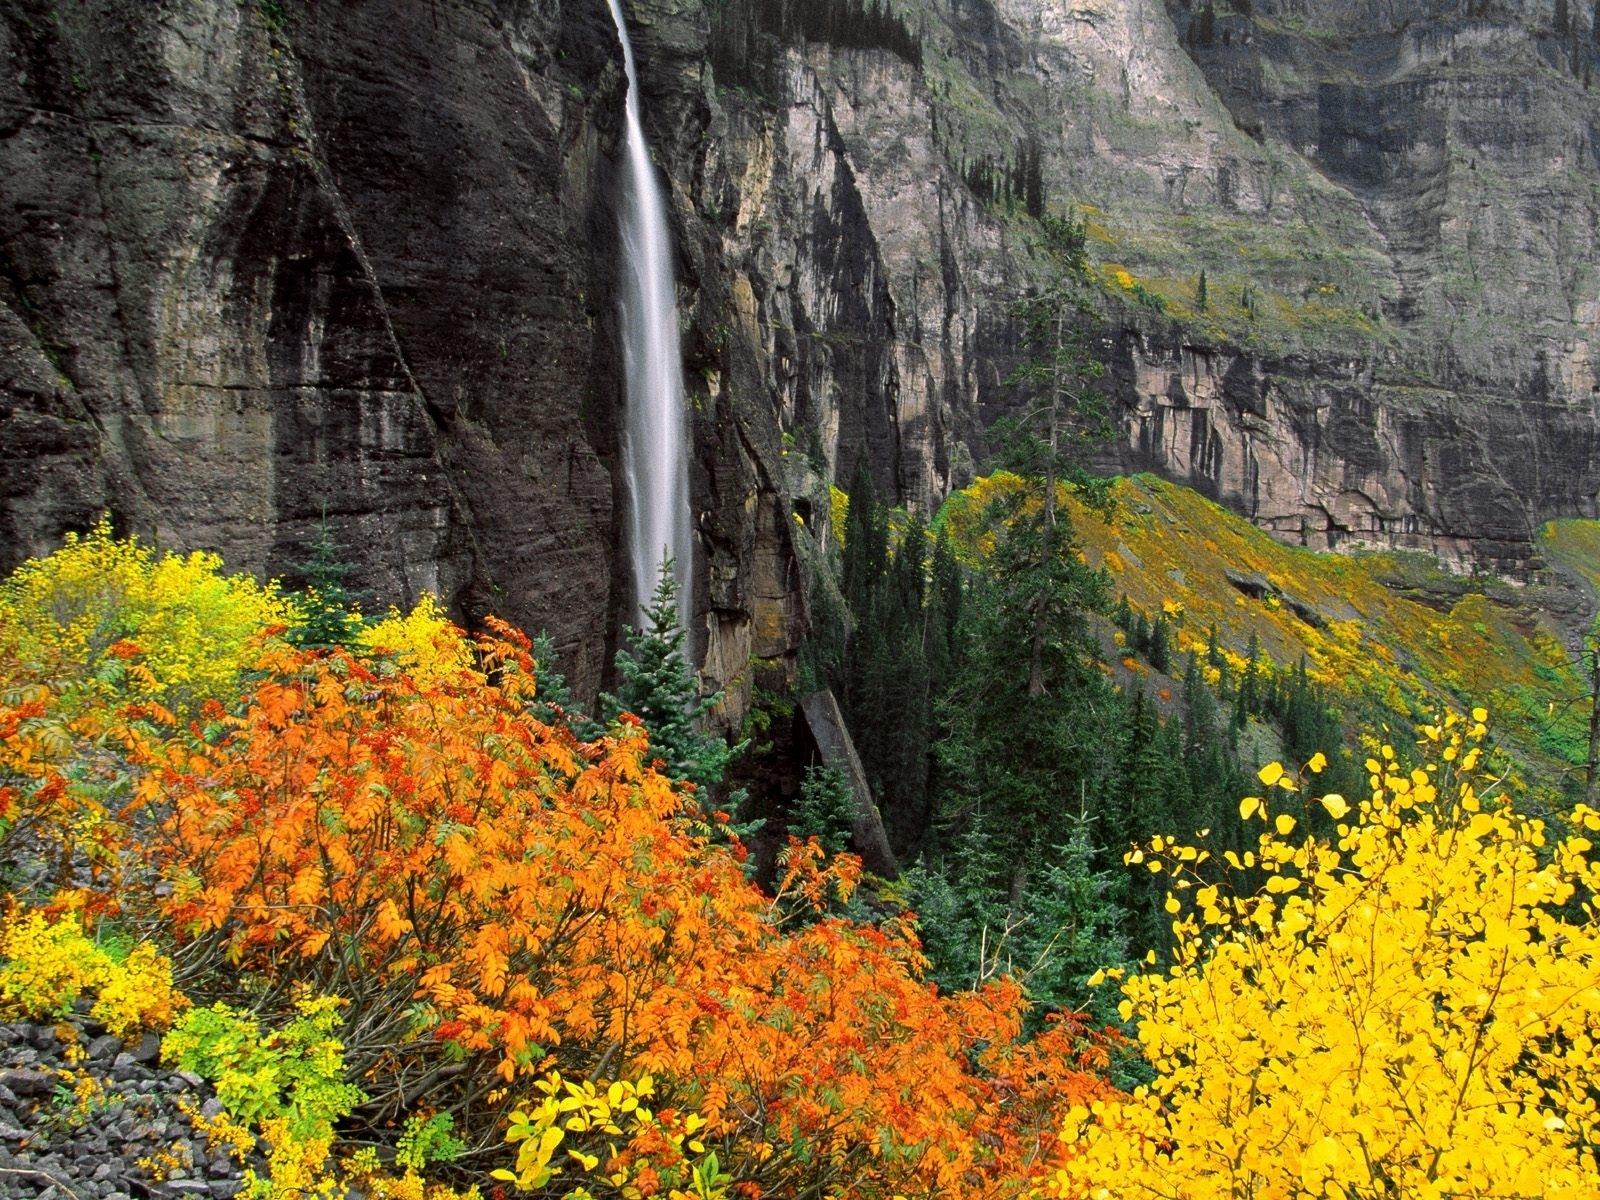 Nature Rock Vegetation Water Waterfall 1600x1200